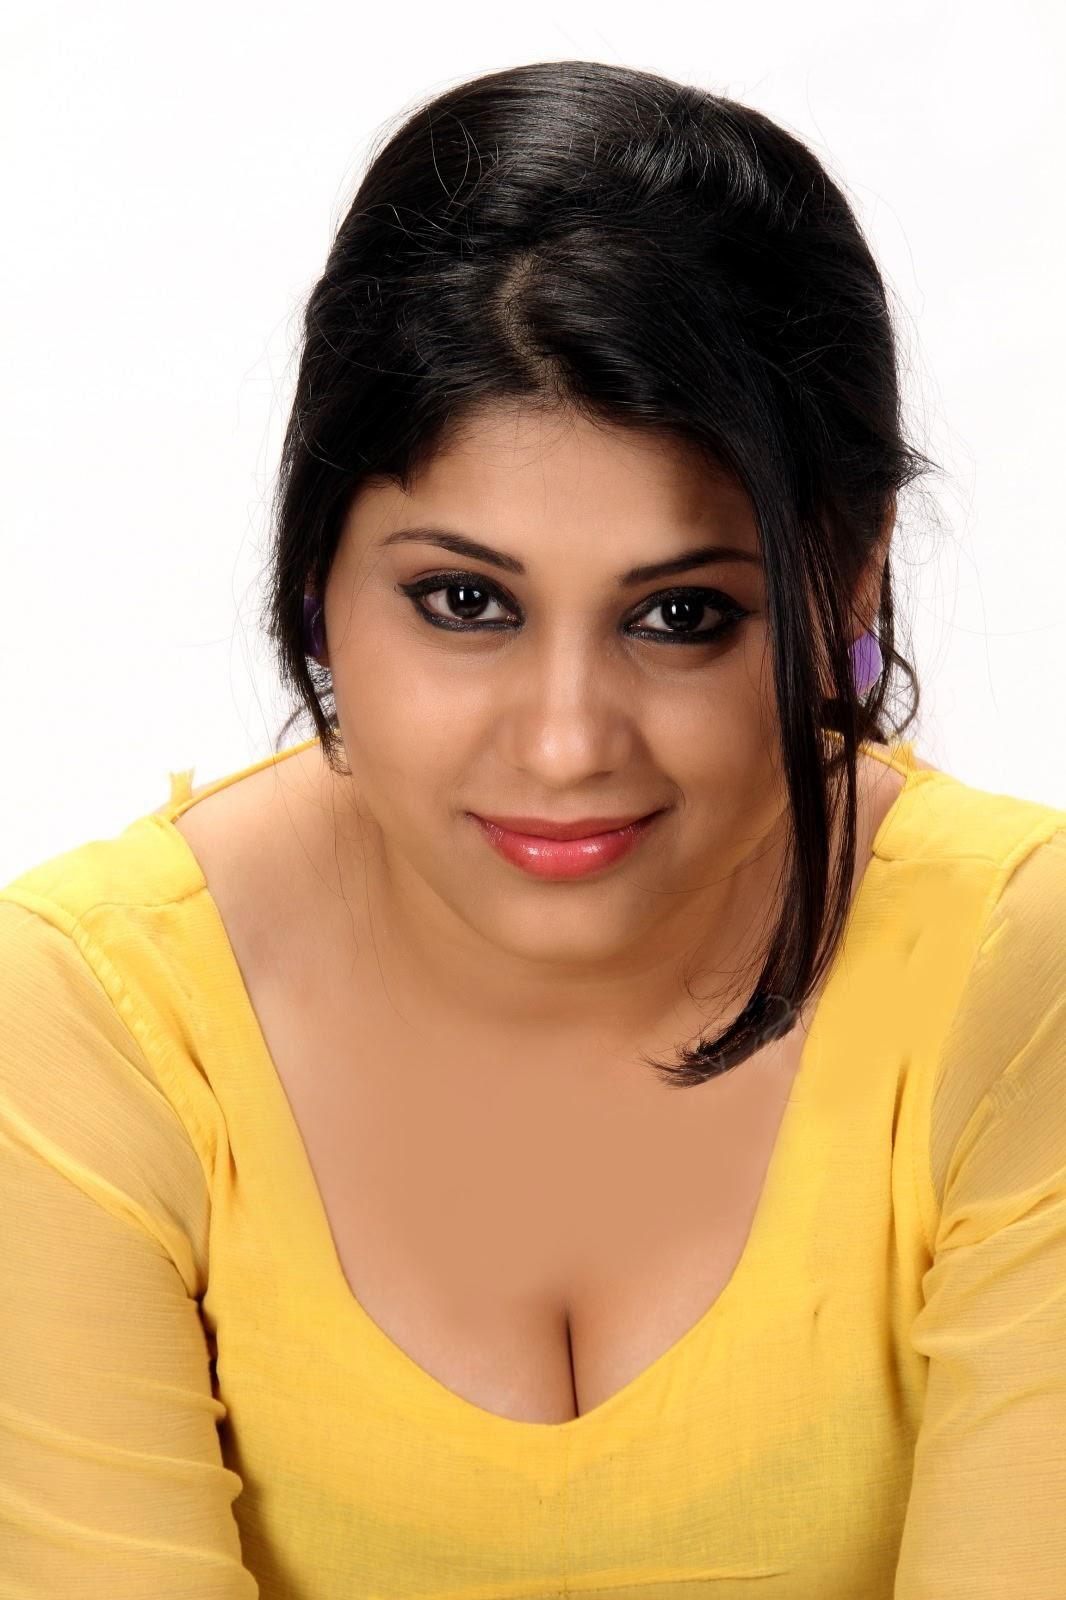 actress cleavage stills